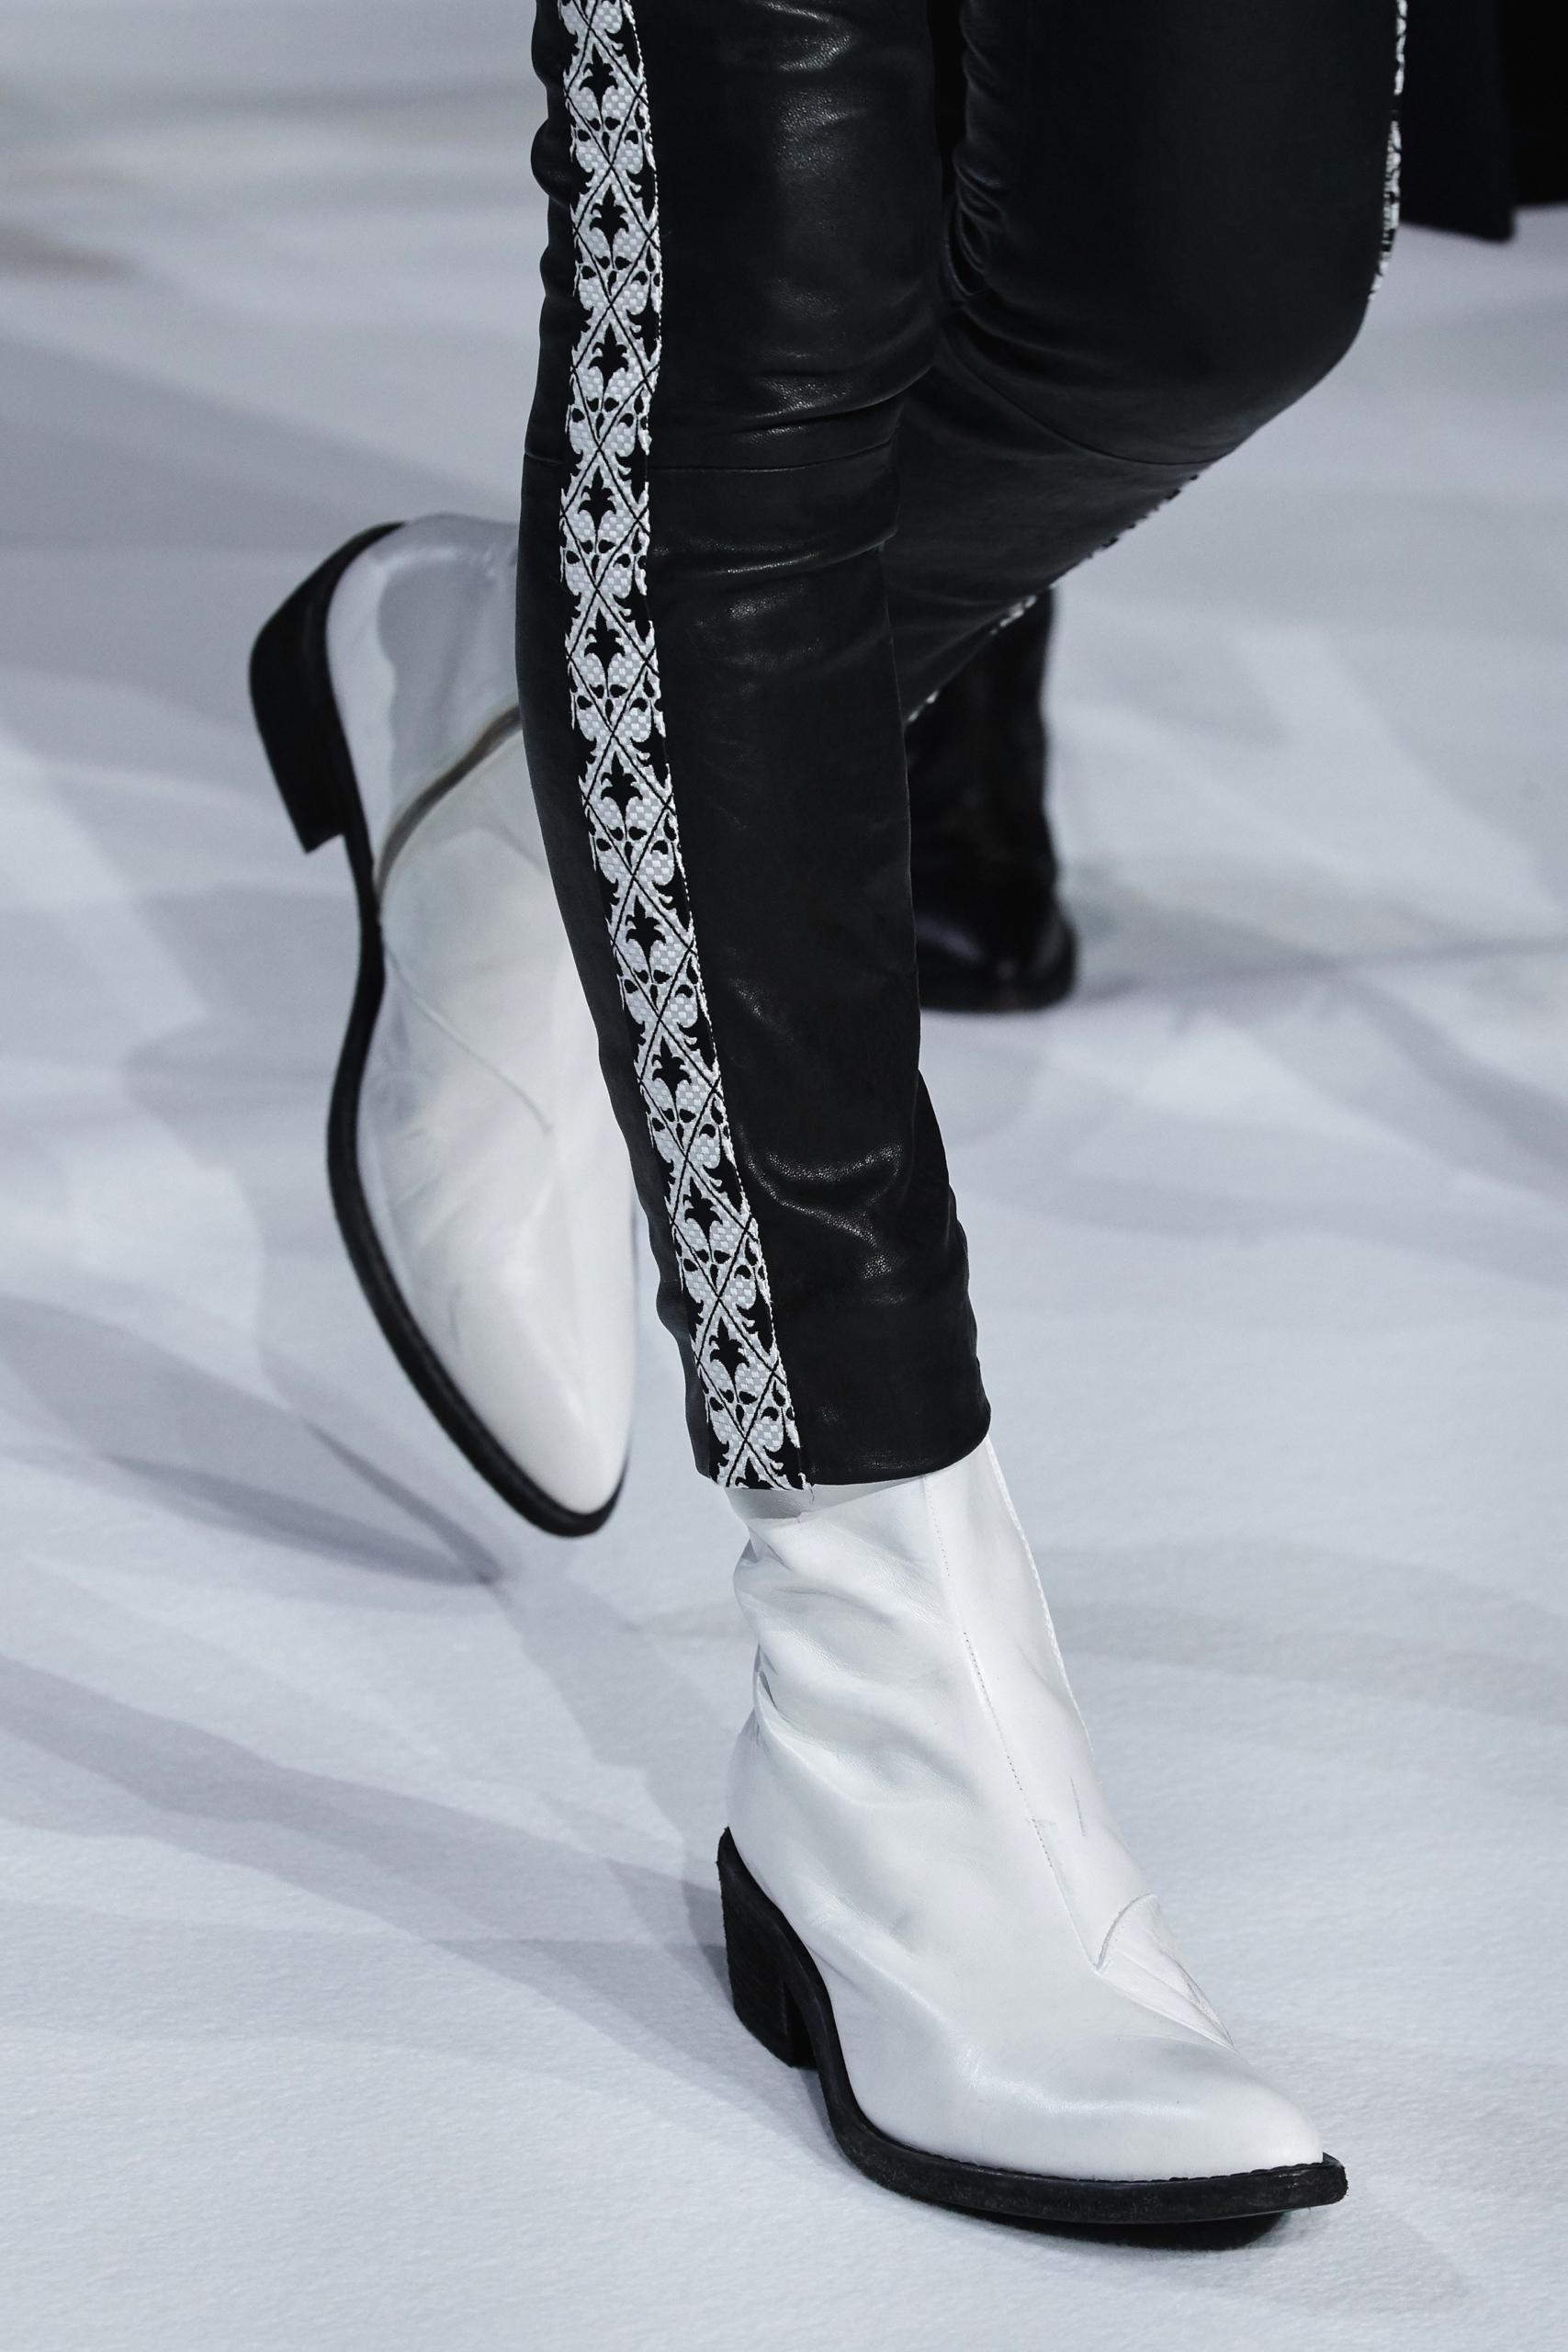 Haider Ackermann Fall/Winter 2020 Ready-to-Wear